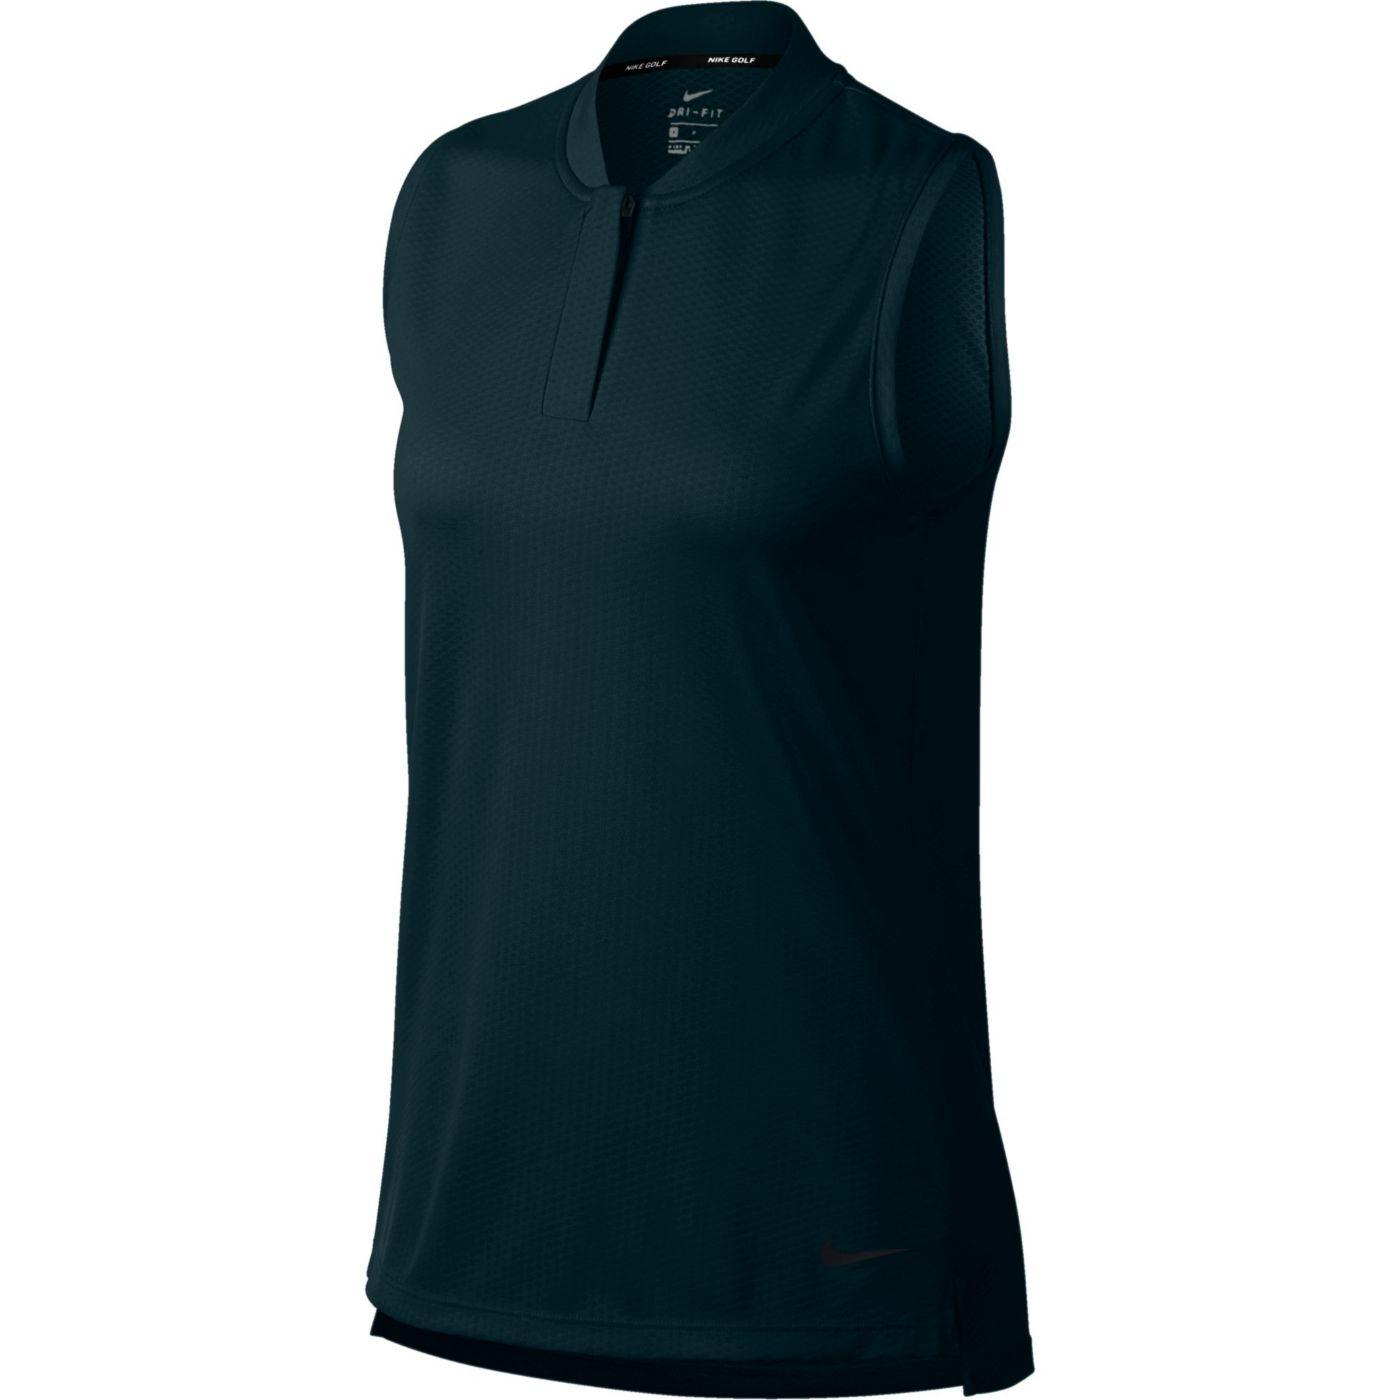 Nike Women's Sleeveless Blade Dry Golf Polo